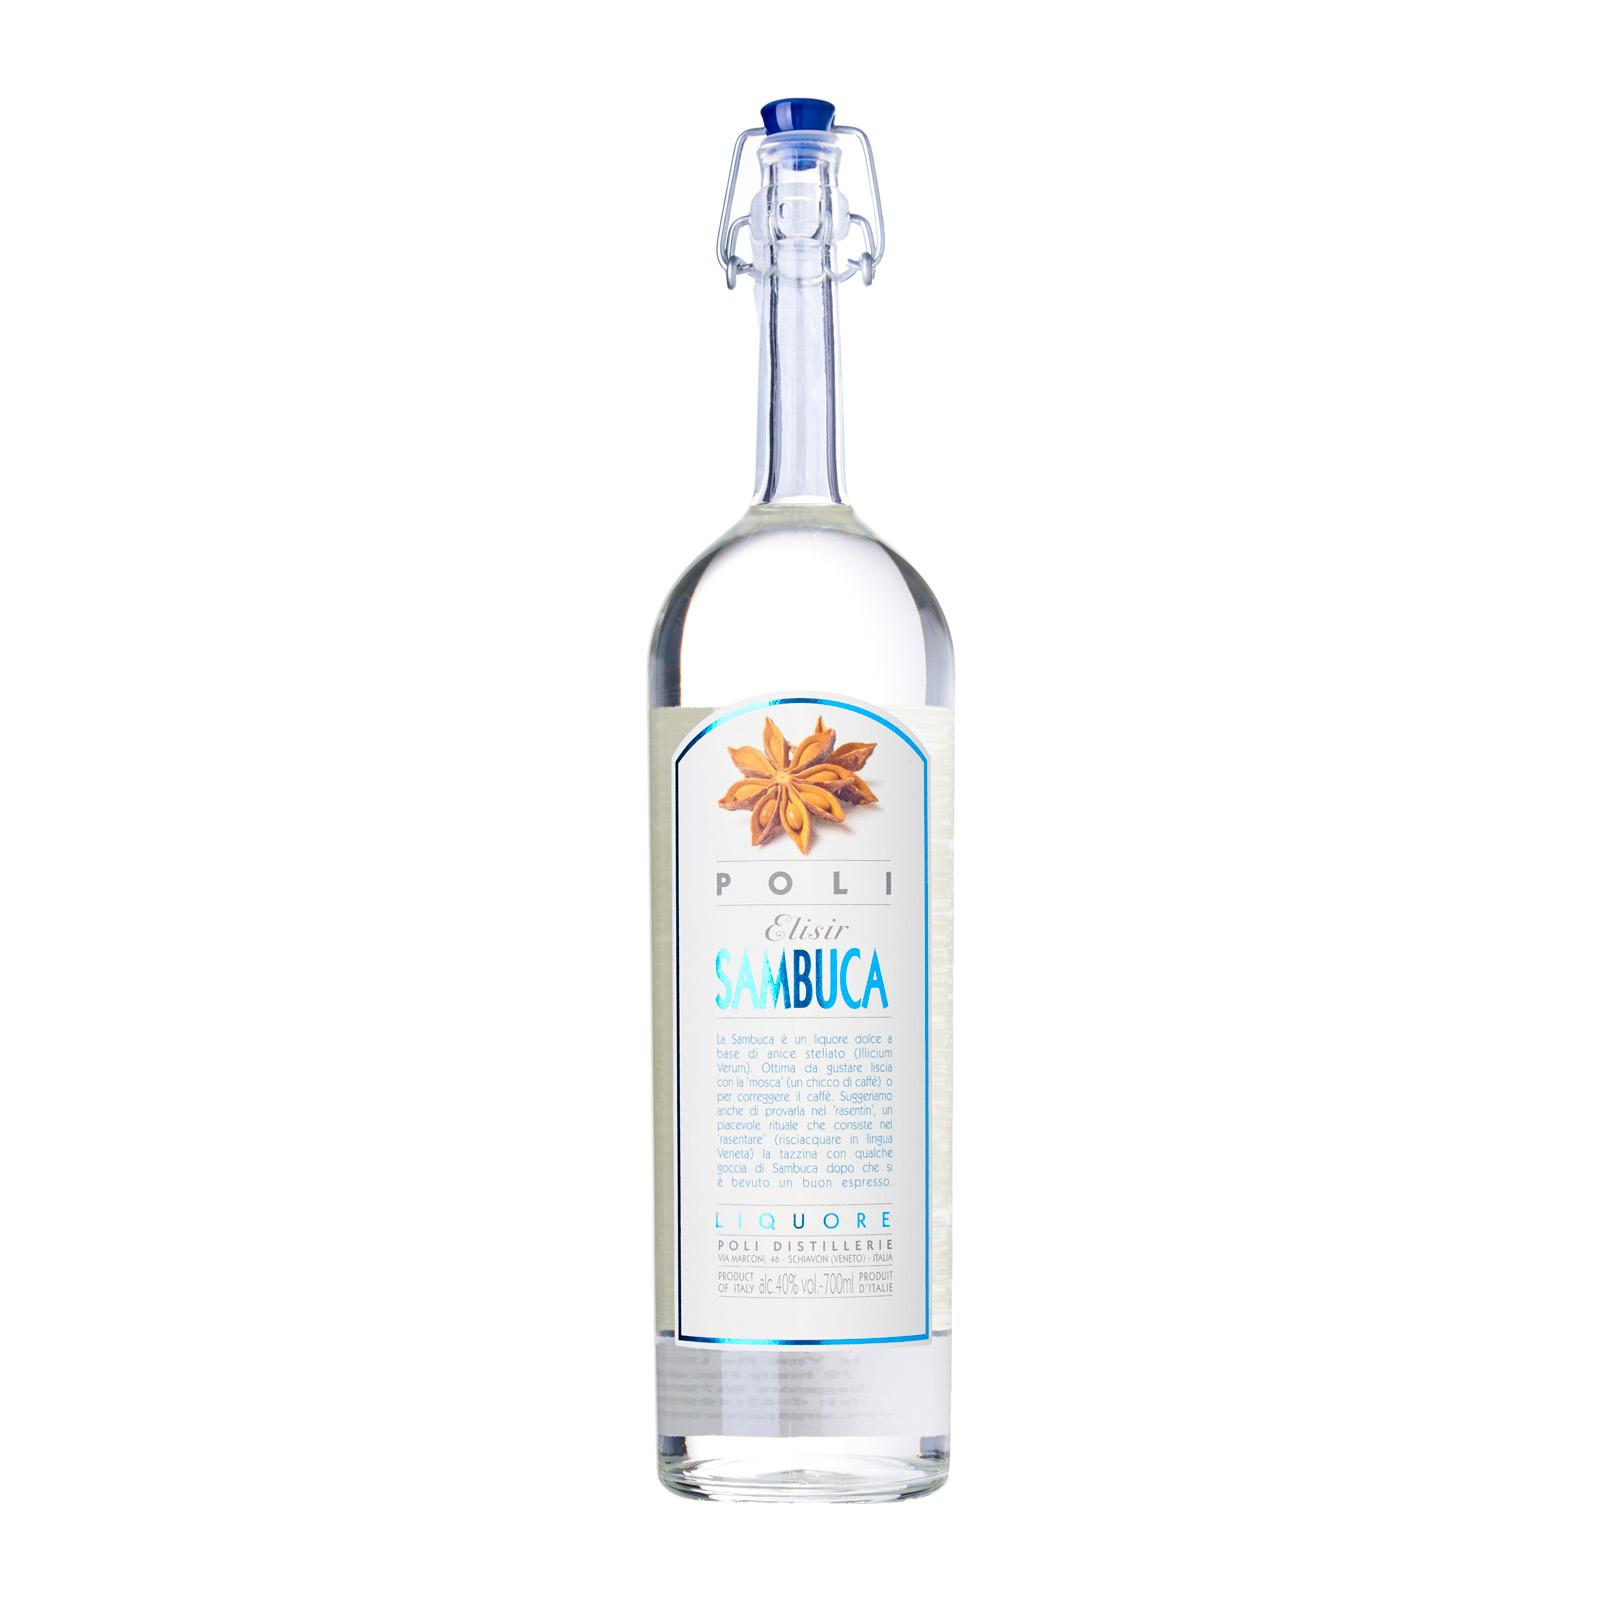 Poli Grappa Sambuca - Anise Liqueur - Italy - Le Vigne